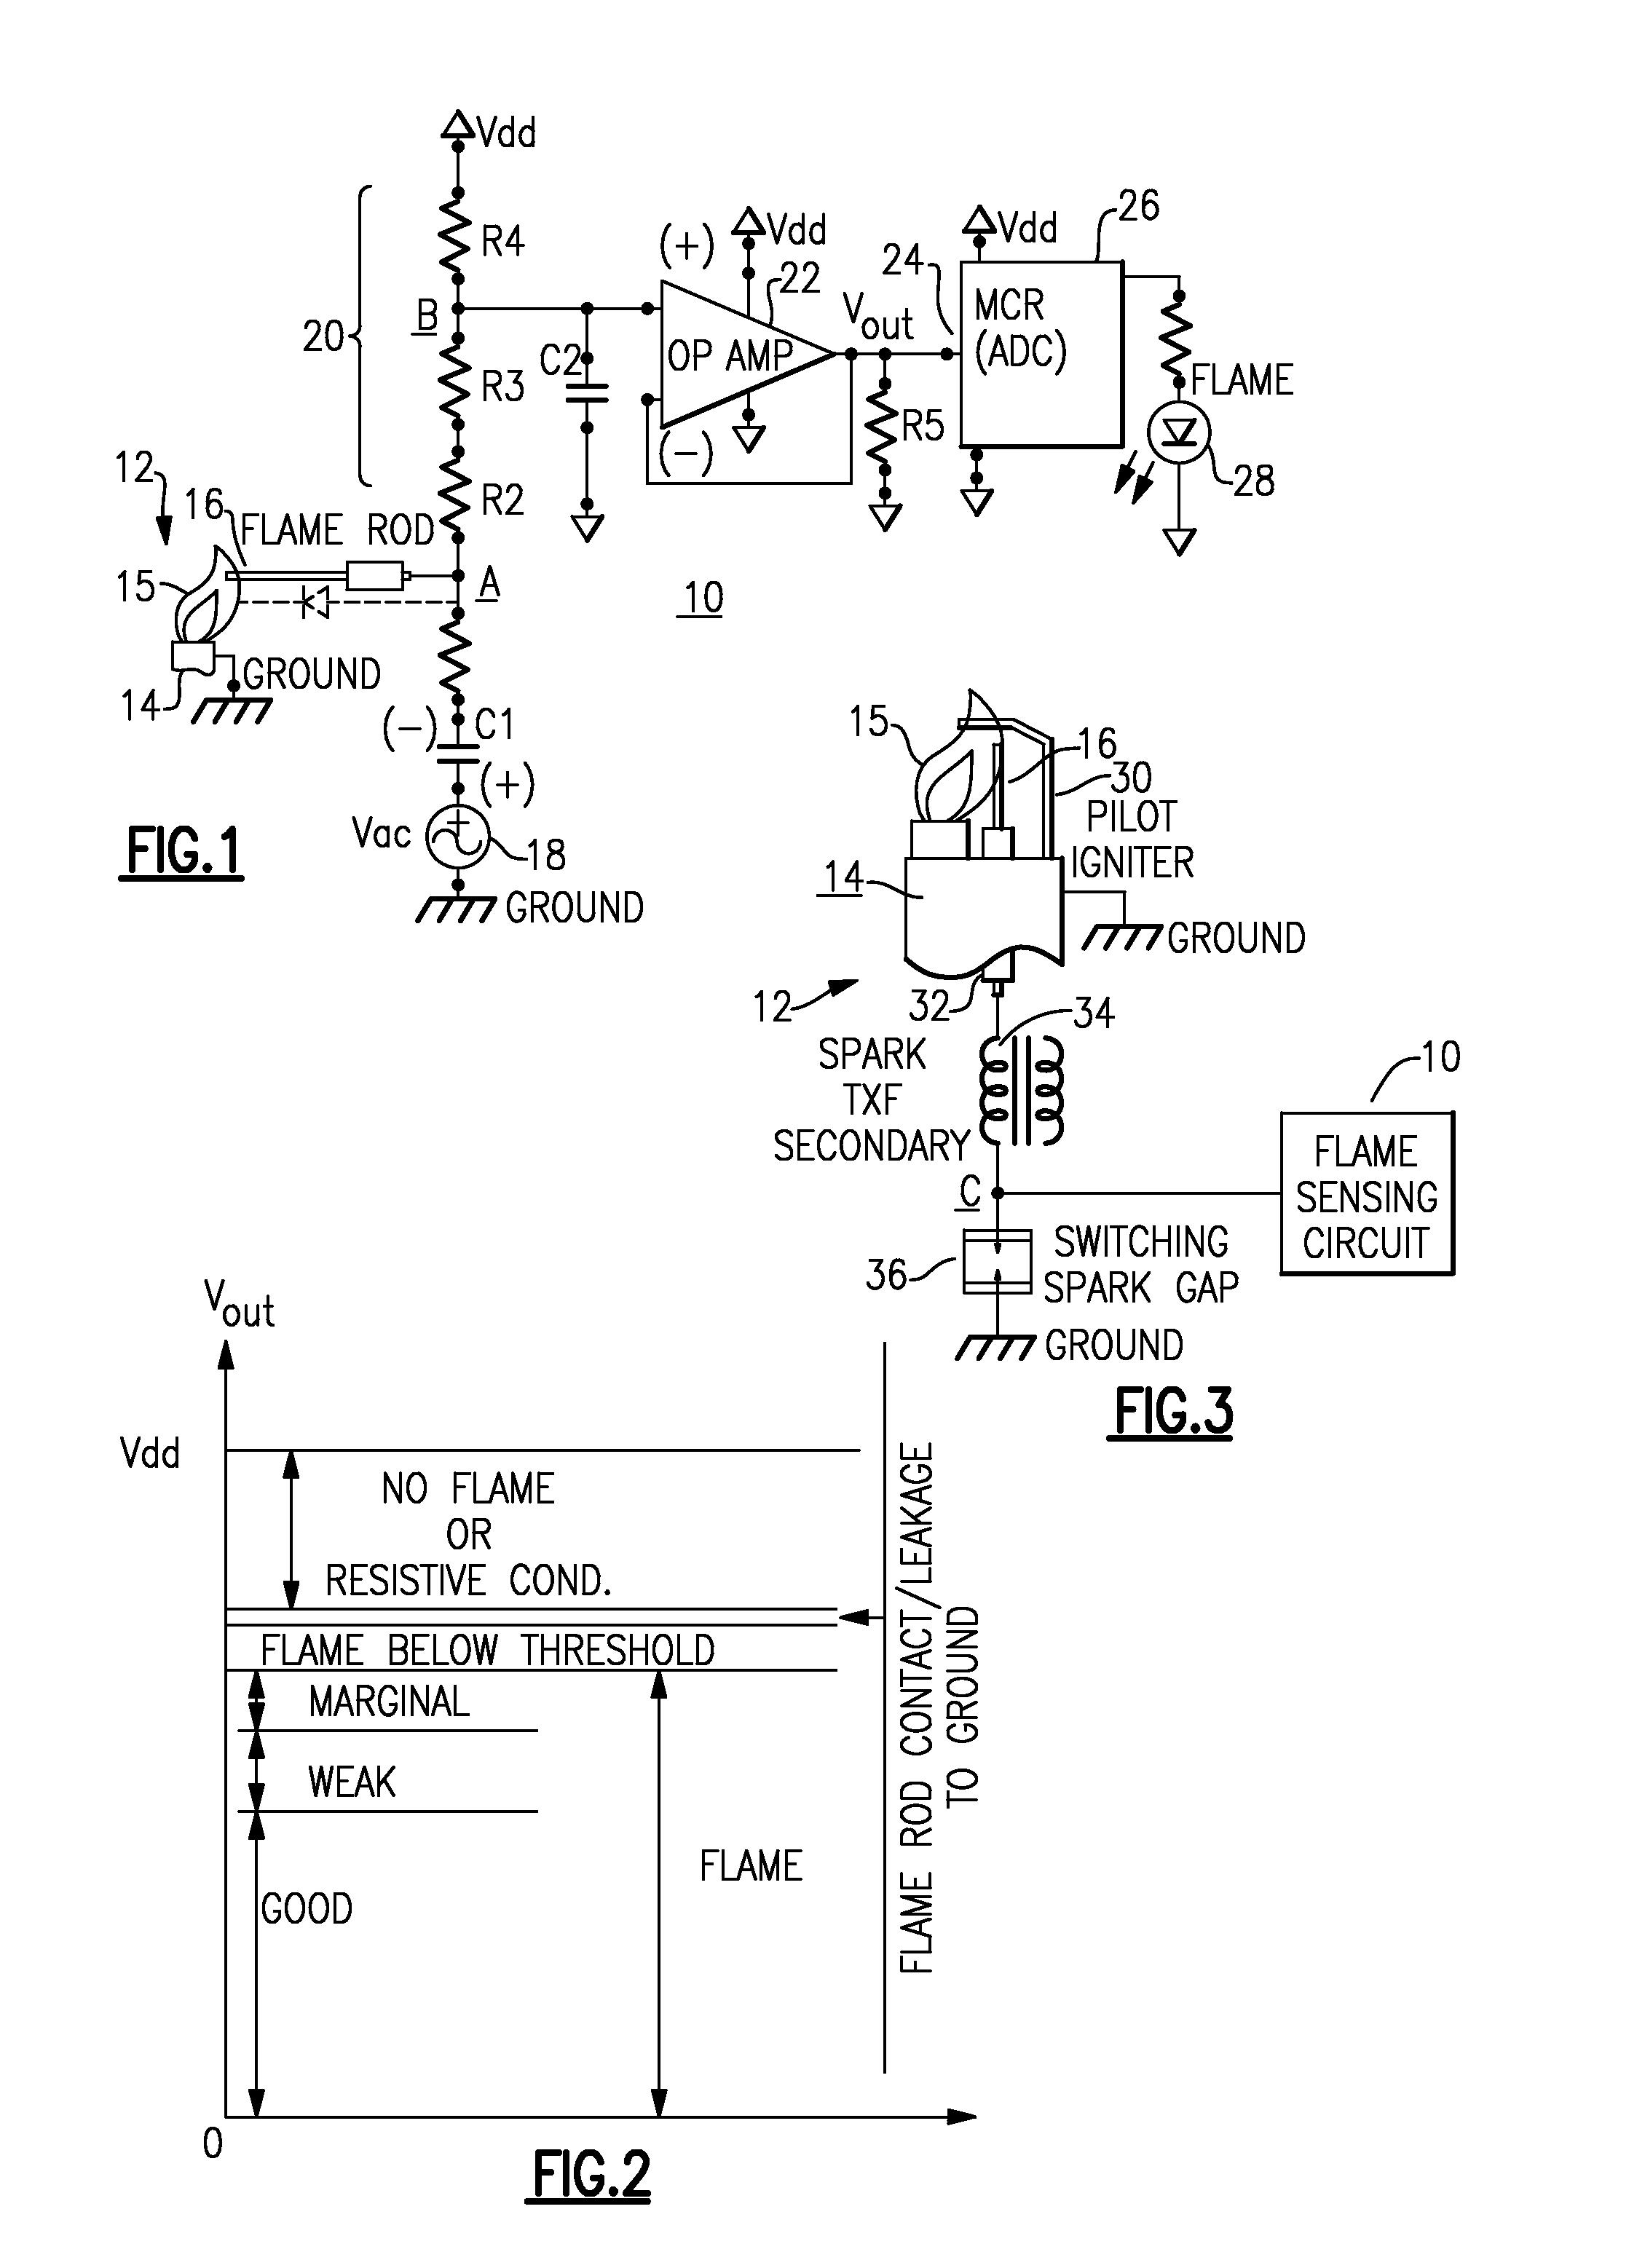 US20120288806A1 20121115 D00001 patent us20120288806 flame sense circuit for gas pilot control flame sensor wiring diagram at suagrazia.org